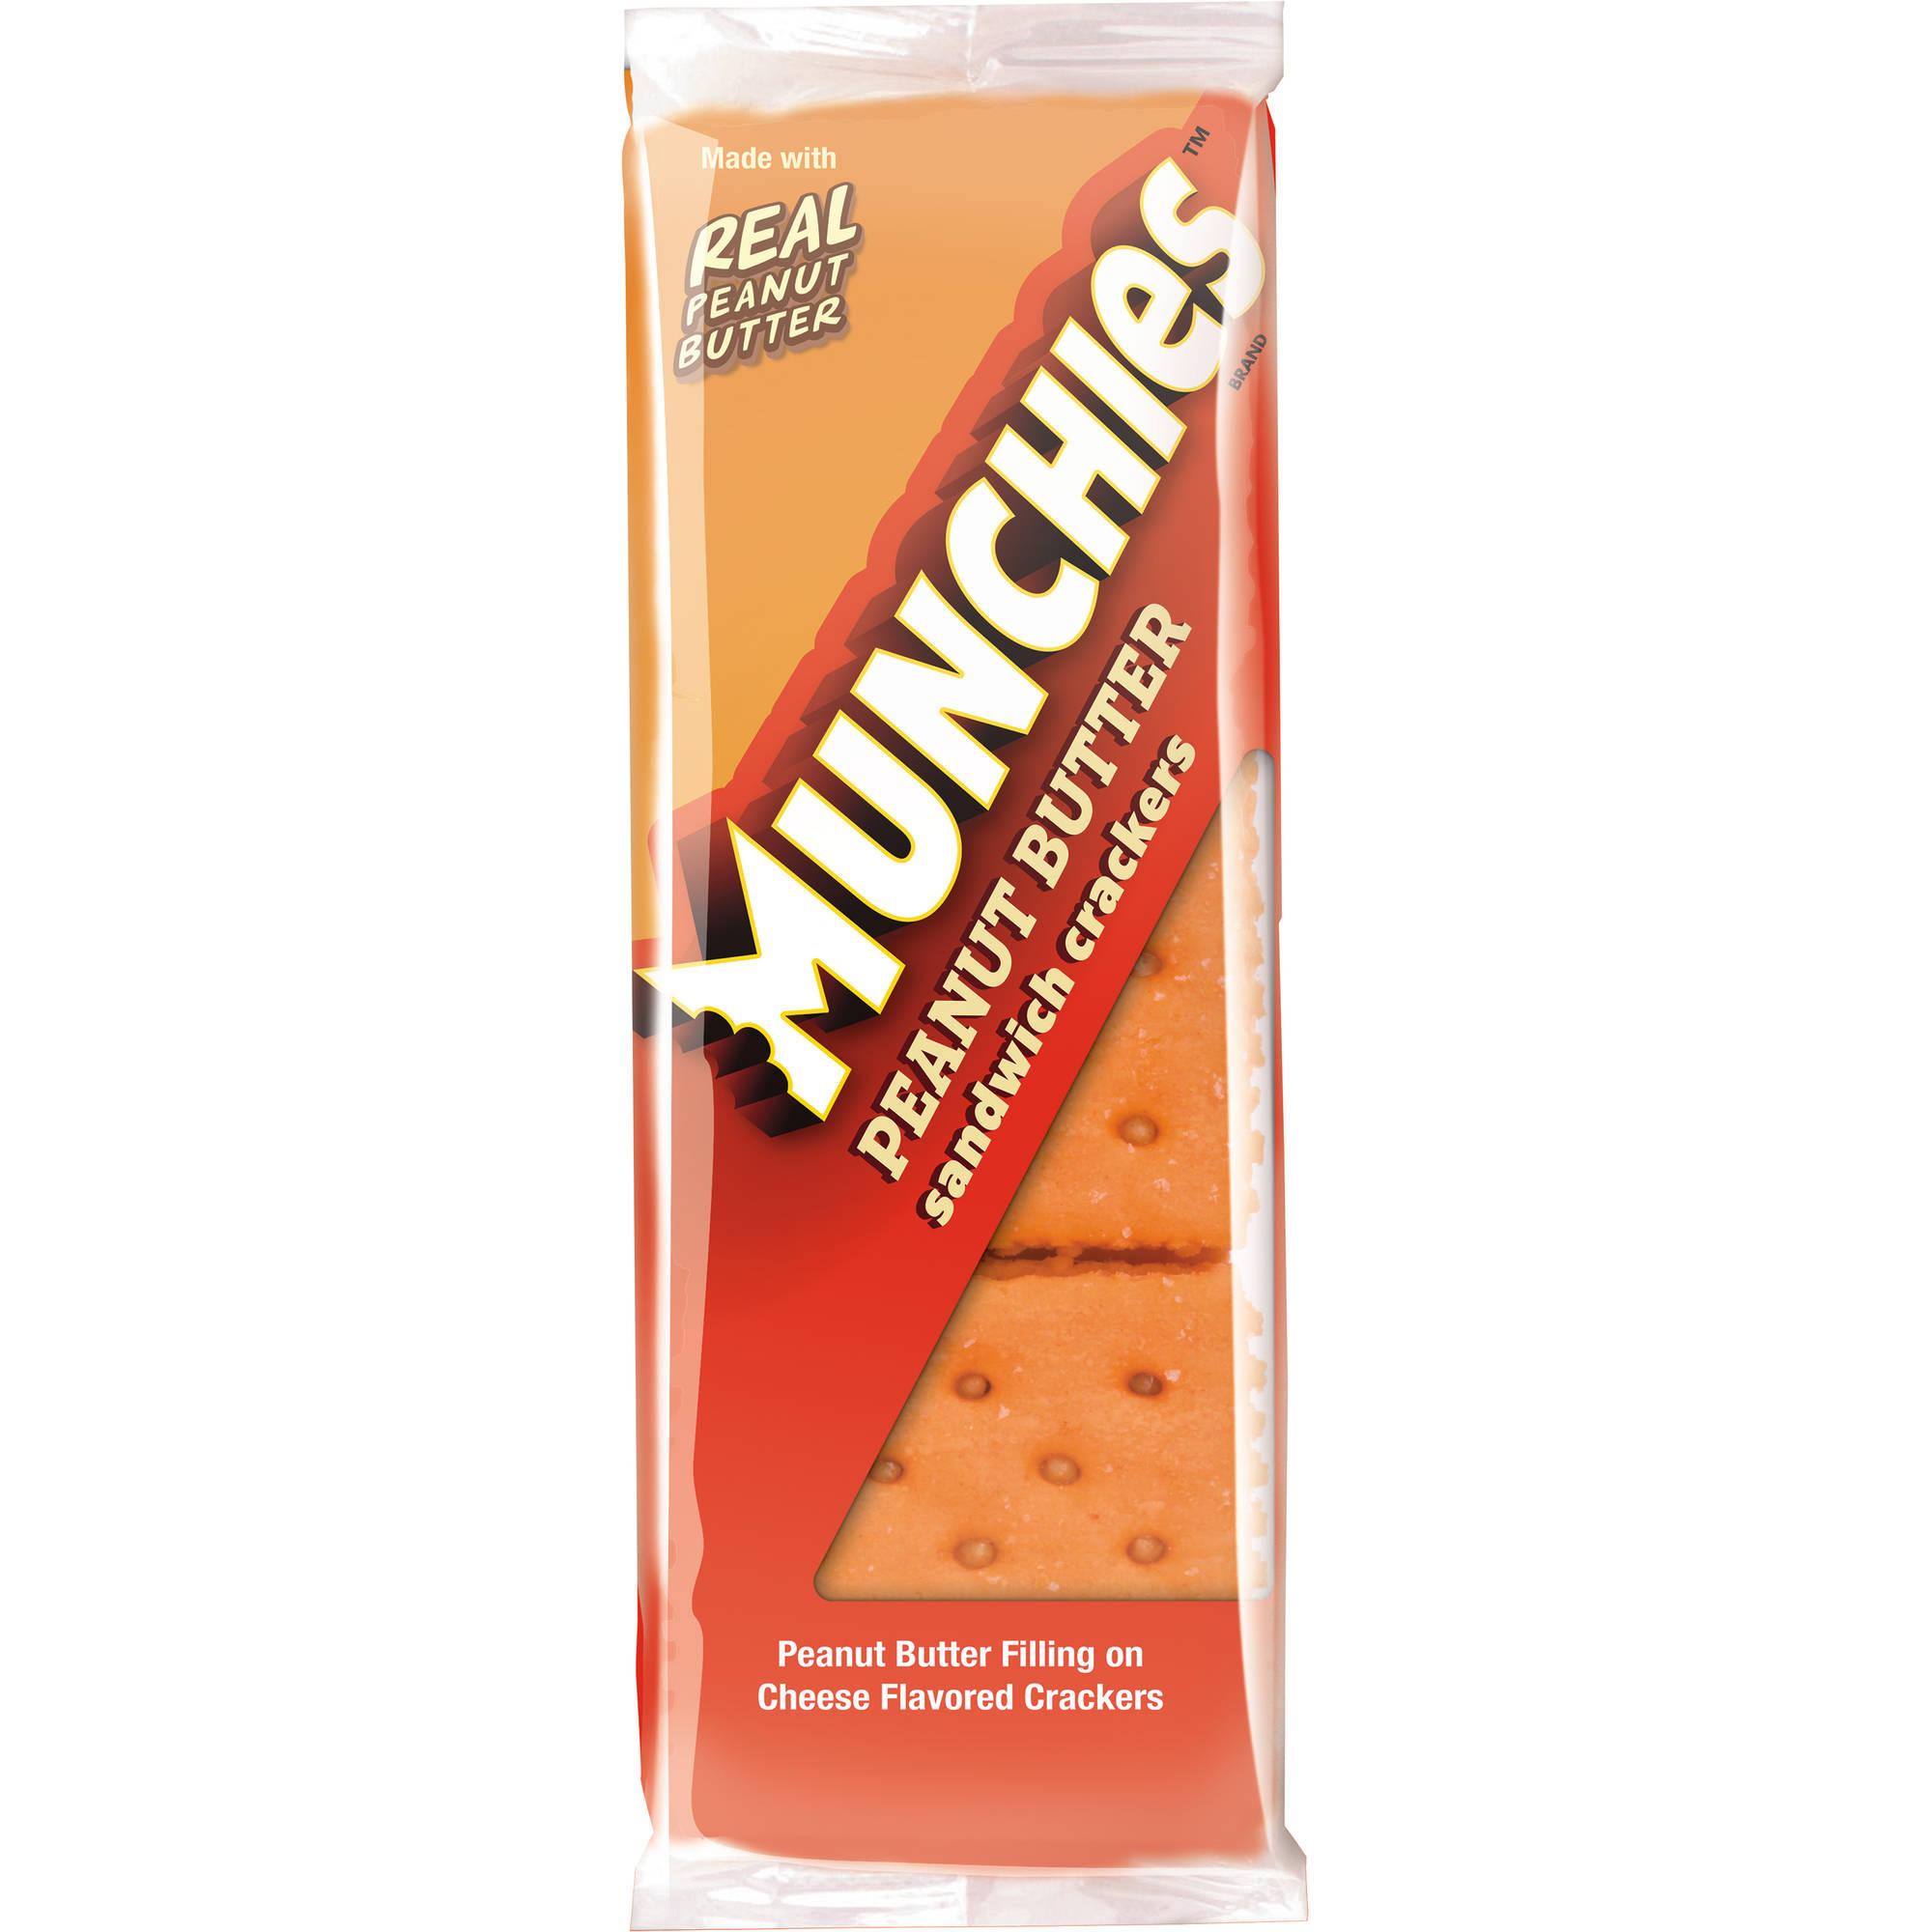 Munchies Peanut Butter Sandwich Crackers , 8 count, 1.42 oz